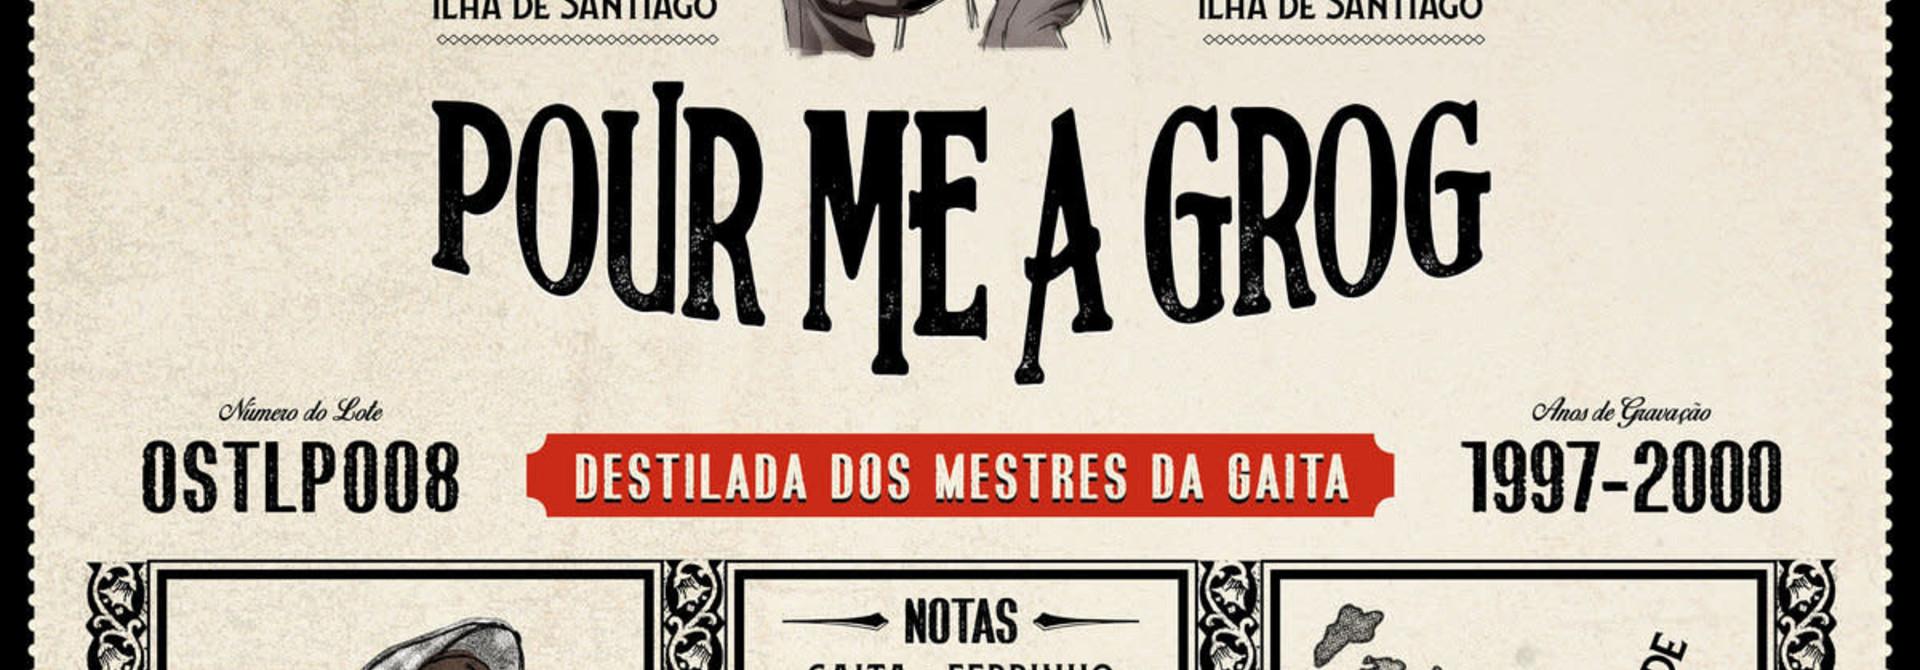 Artistes Variés • Pour Me A Grog: The Funana Revolt in 1990s Cabo Verde